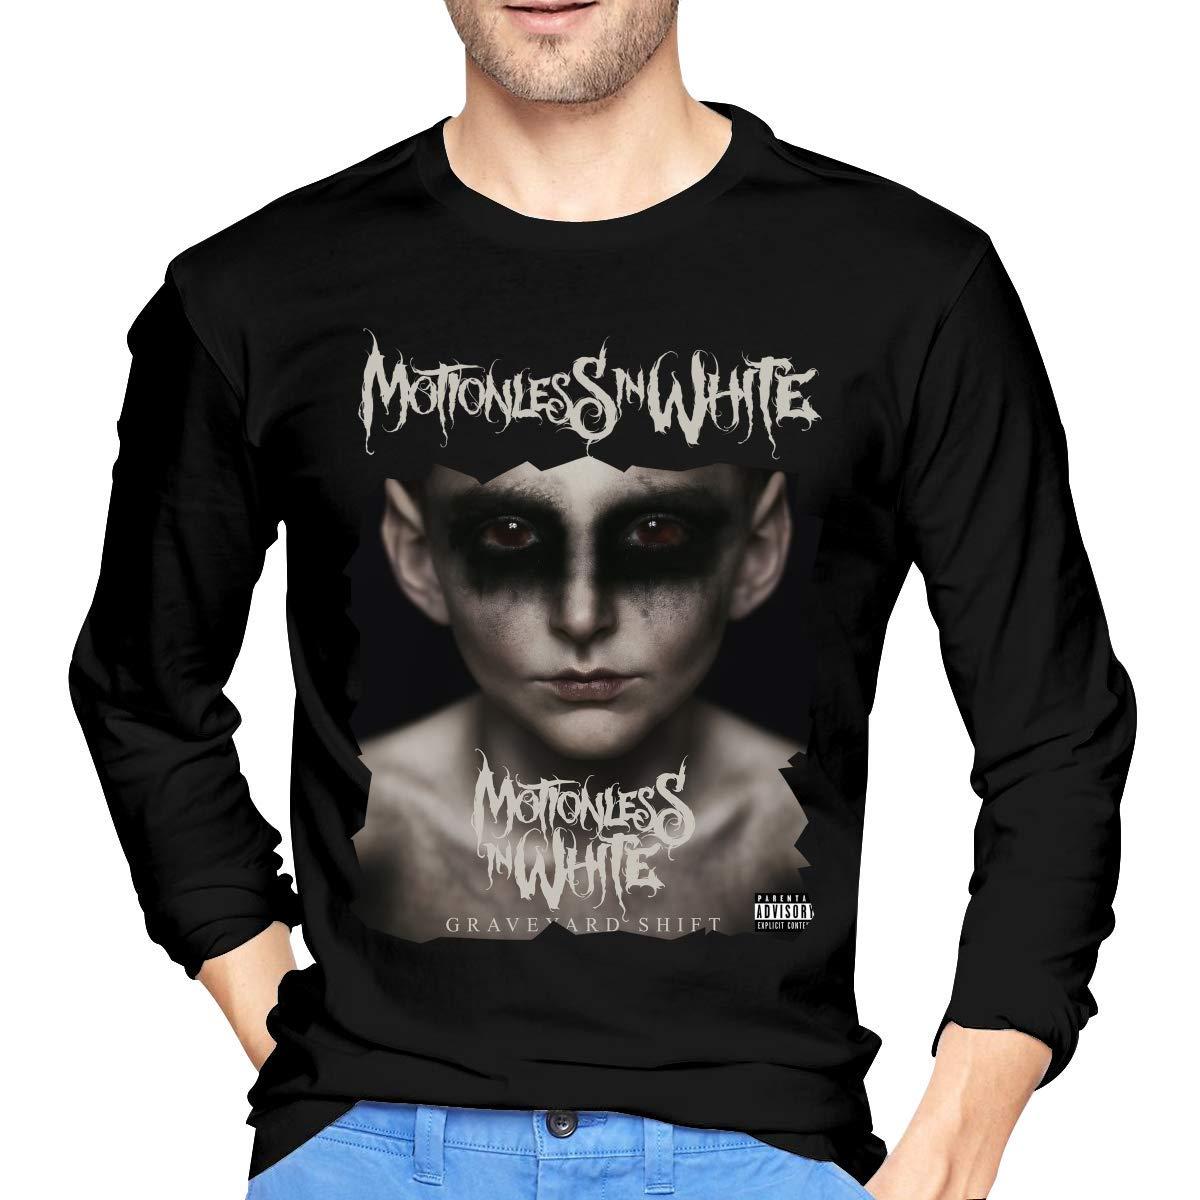 Fssatung S Motionless In Graveyard Shift T Shirts Black